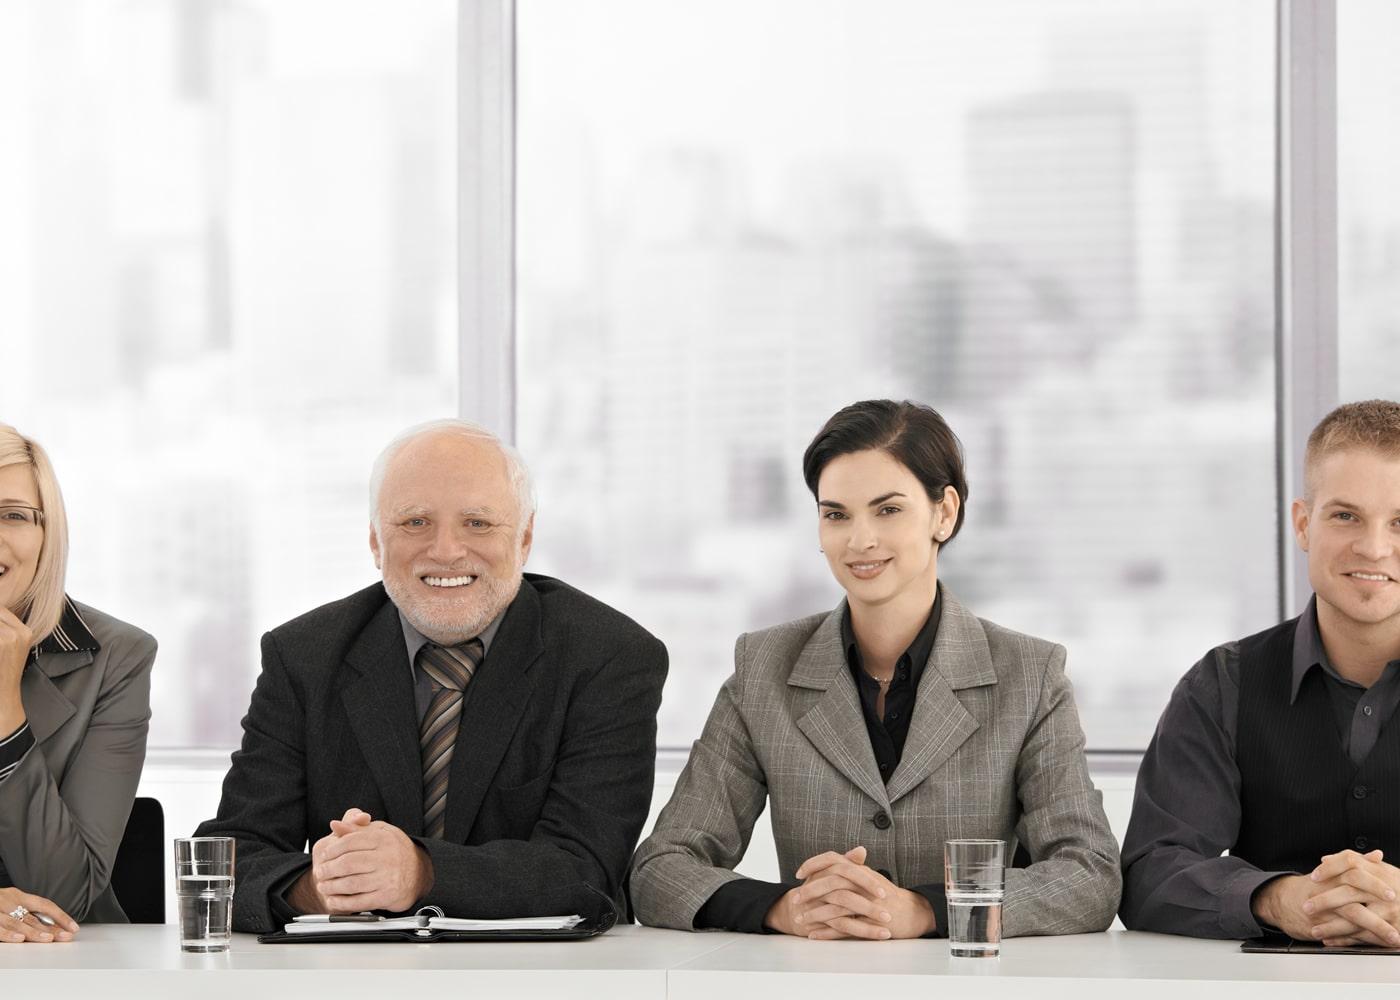 naem-webinar-2015-engaging-and-managing-a-multigenerational-workforce-700x500